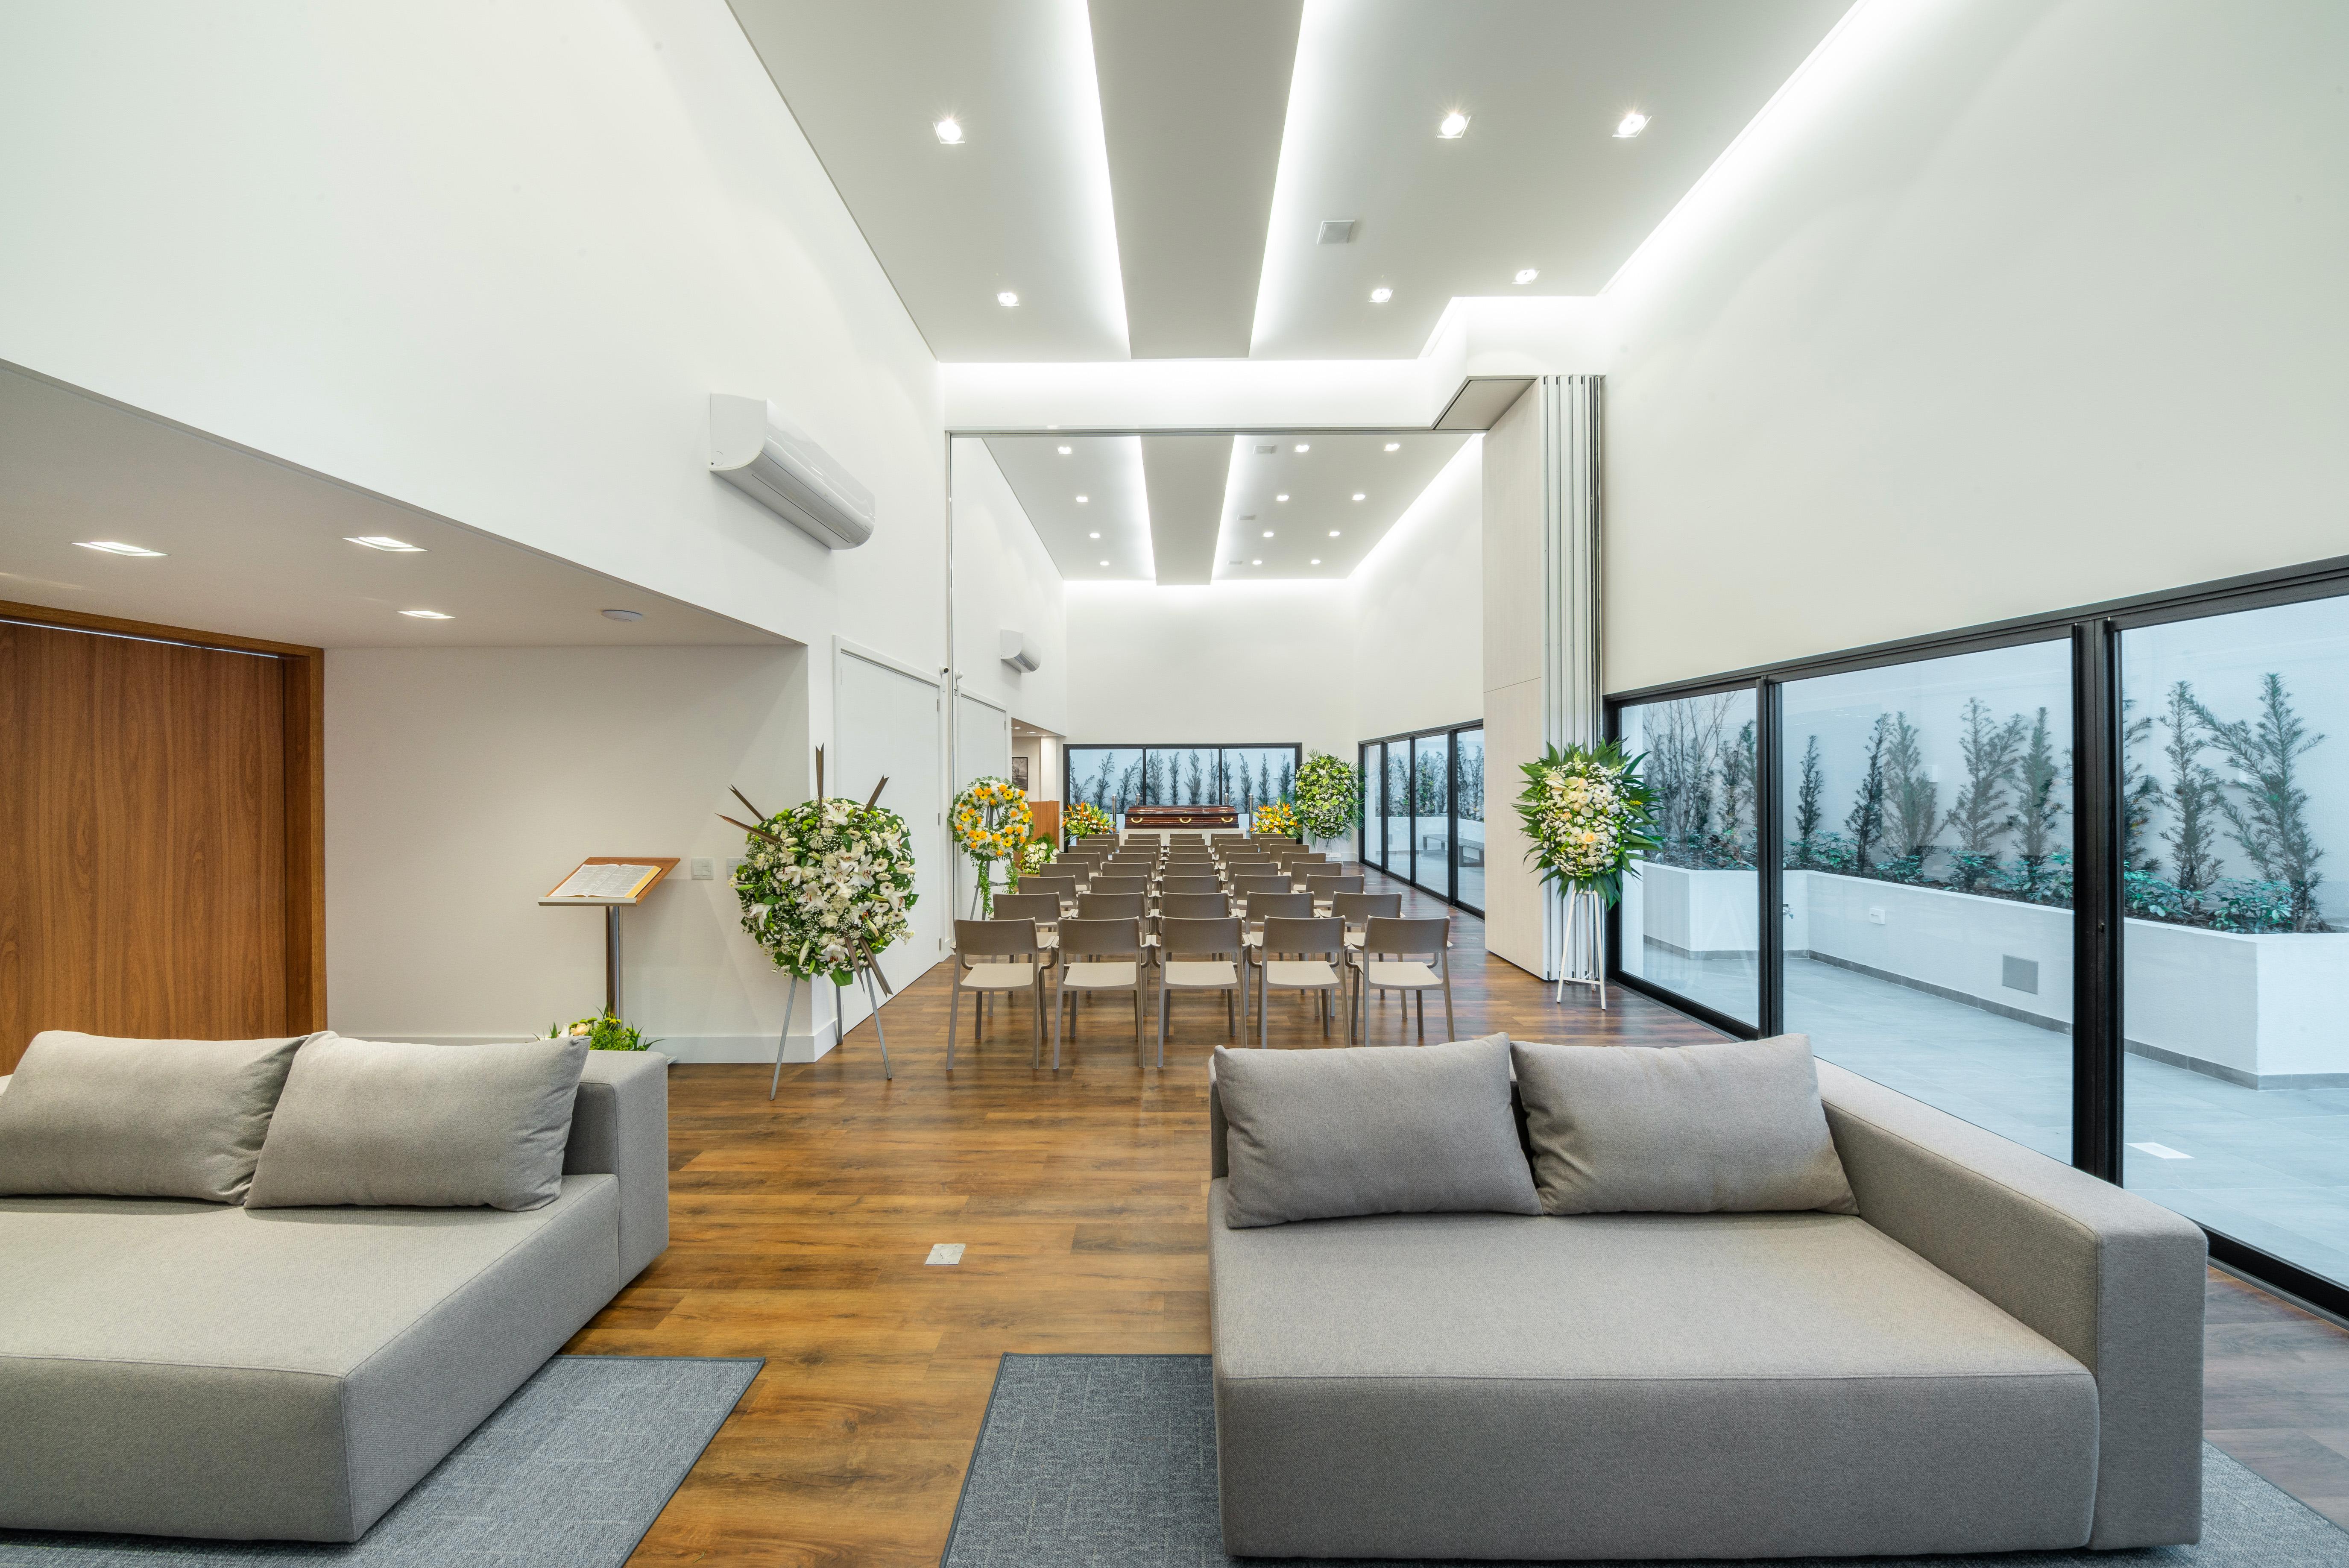 memorial-luto-curitiba-arquitetura-decoracao-conforto-gourmet-area-quarto-inedito